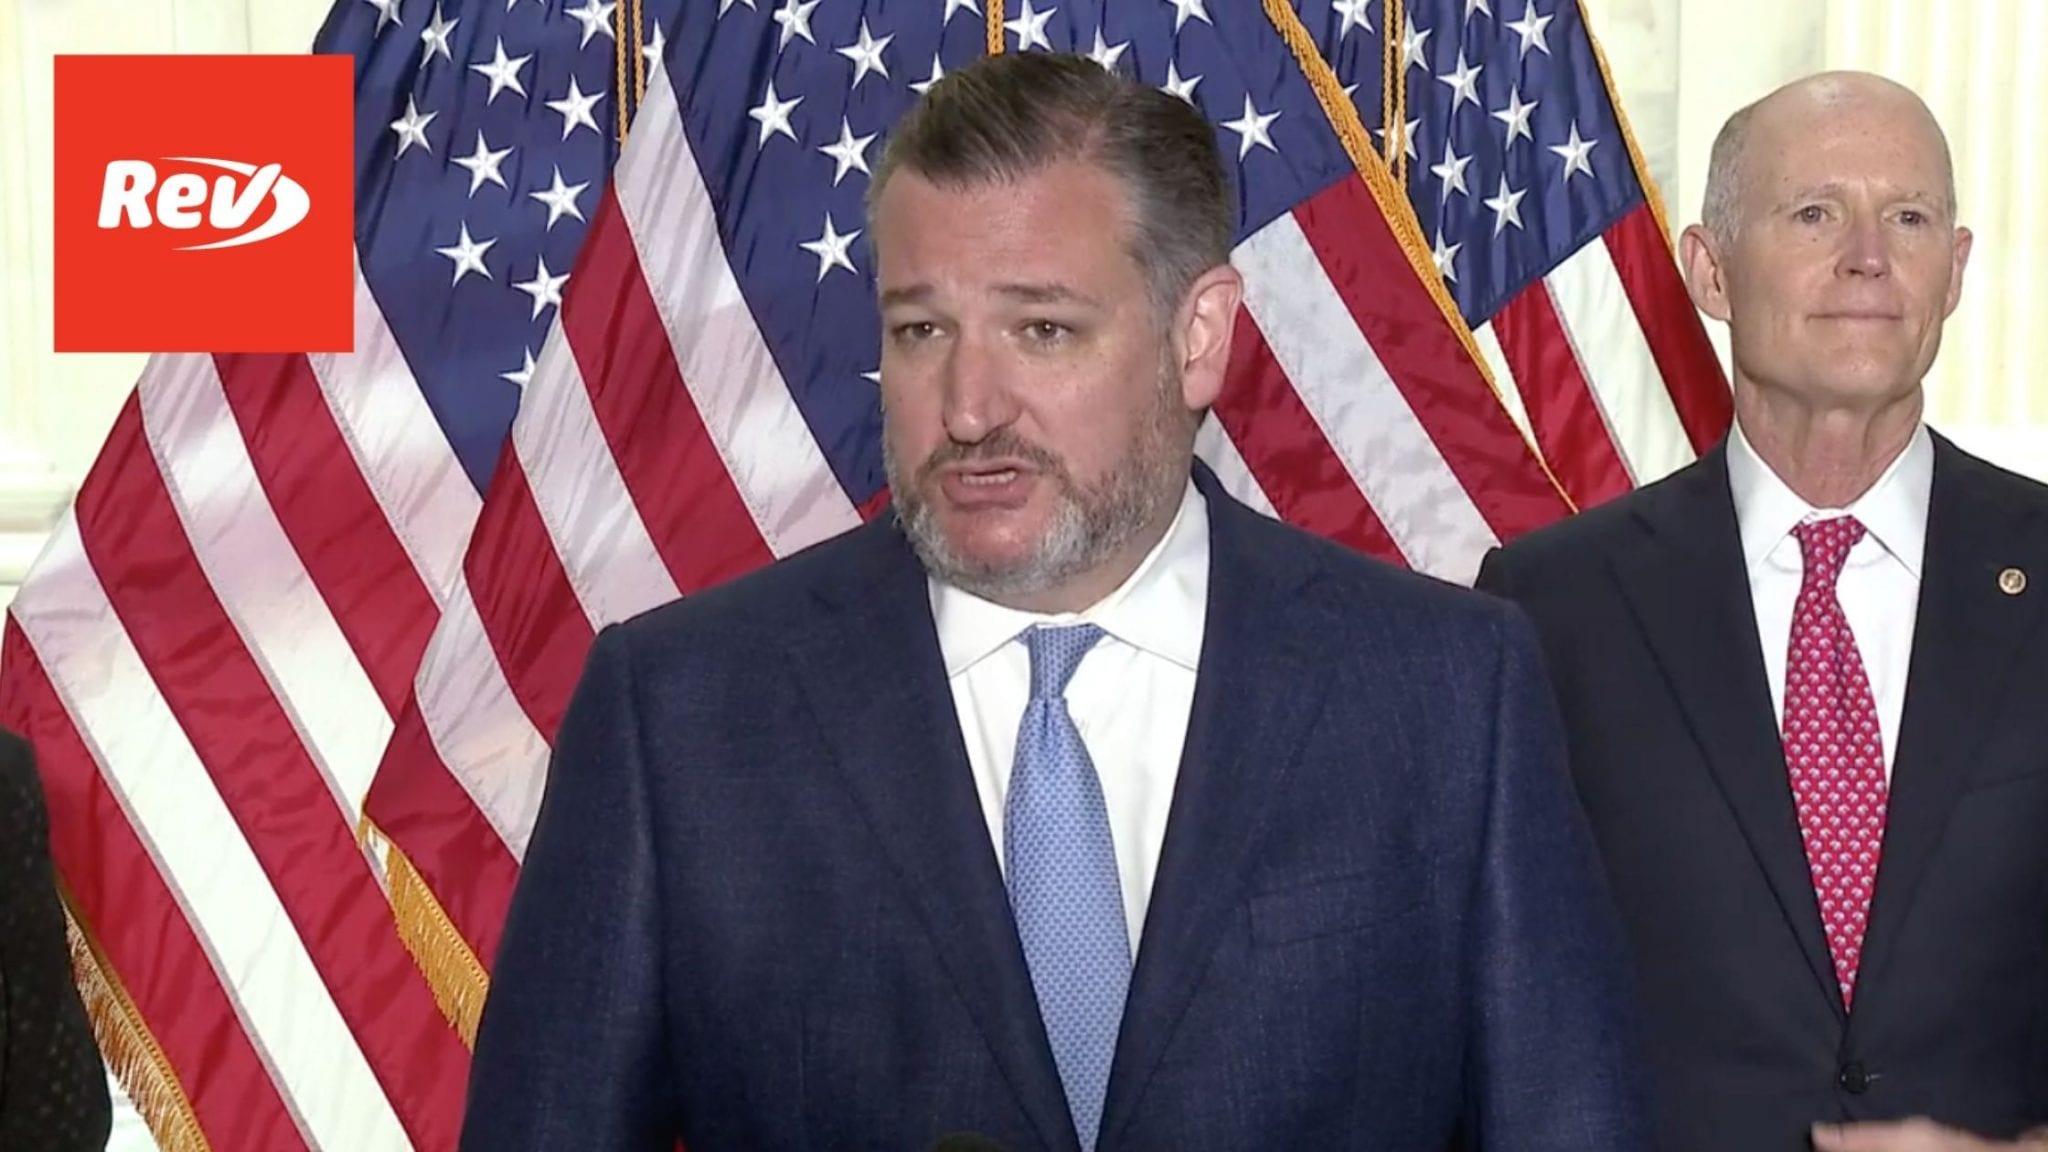 Ted Cruz, Senate GOP Press Conference Transcript May 19: Conflict in Israel